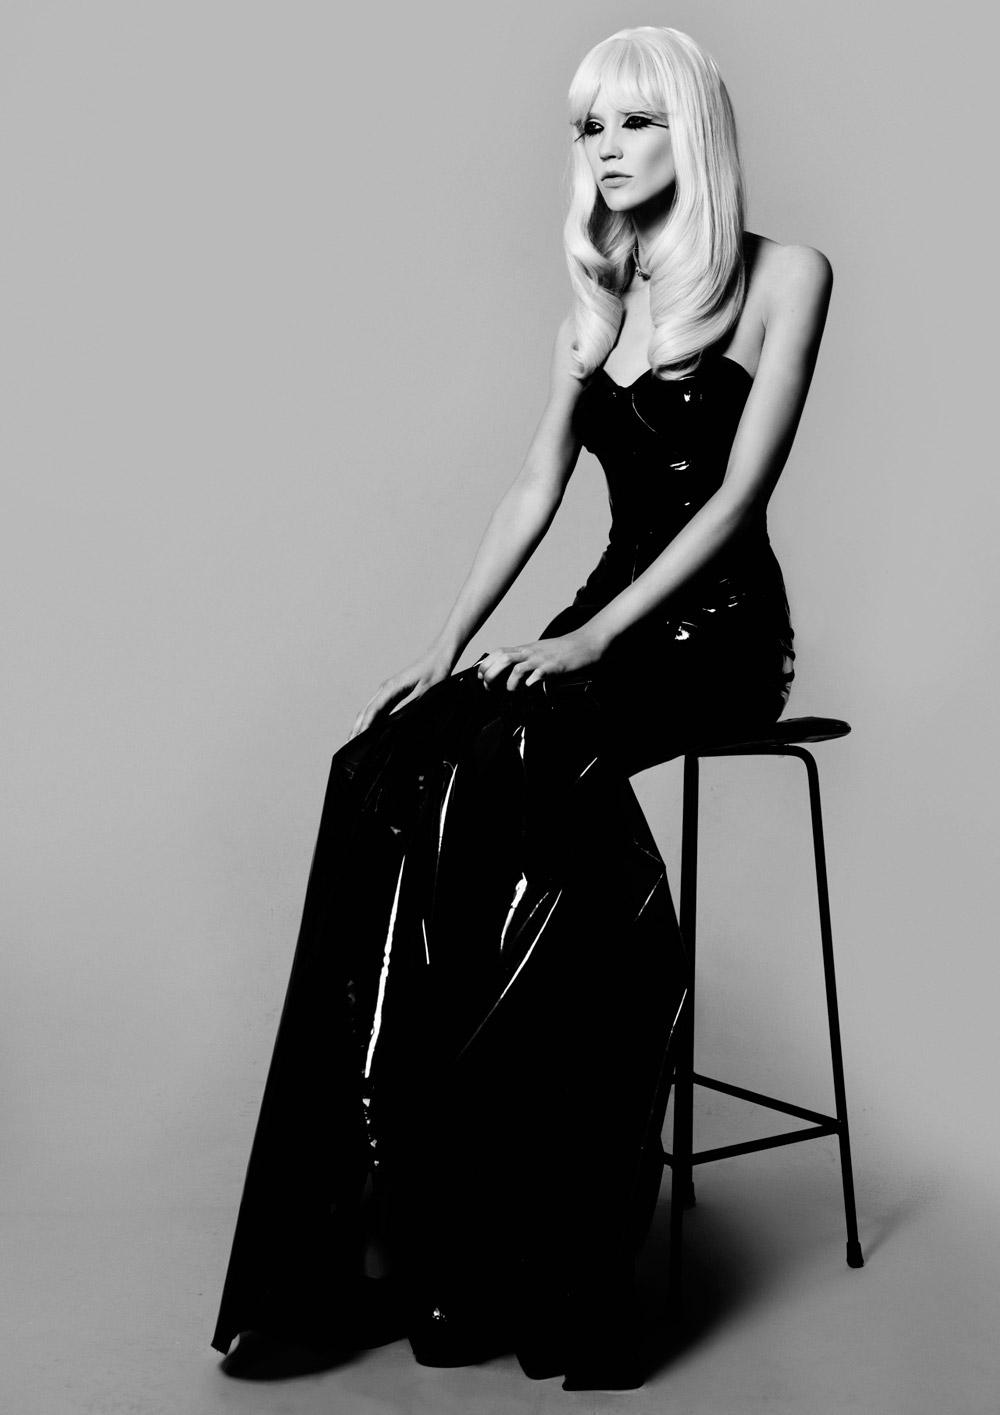 Manuel-Diaz-Visual-Atelier-8-Interview-Fashion-6.jpg